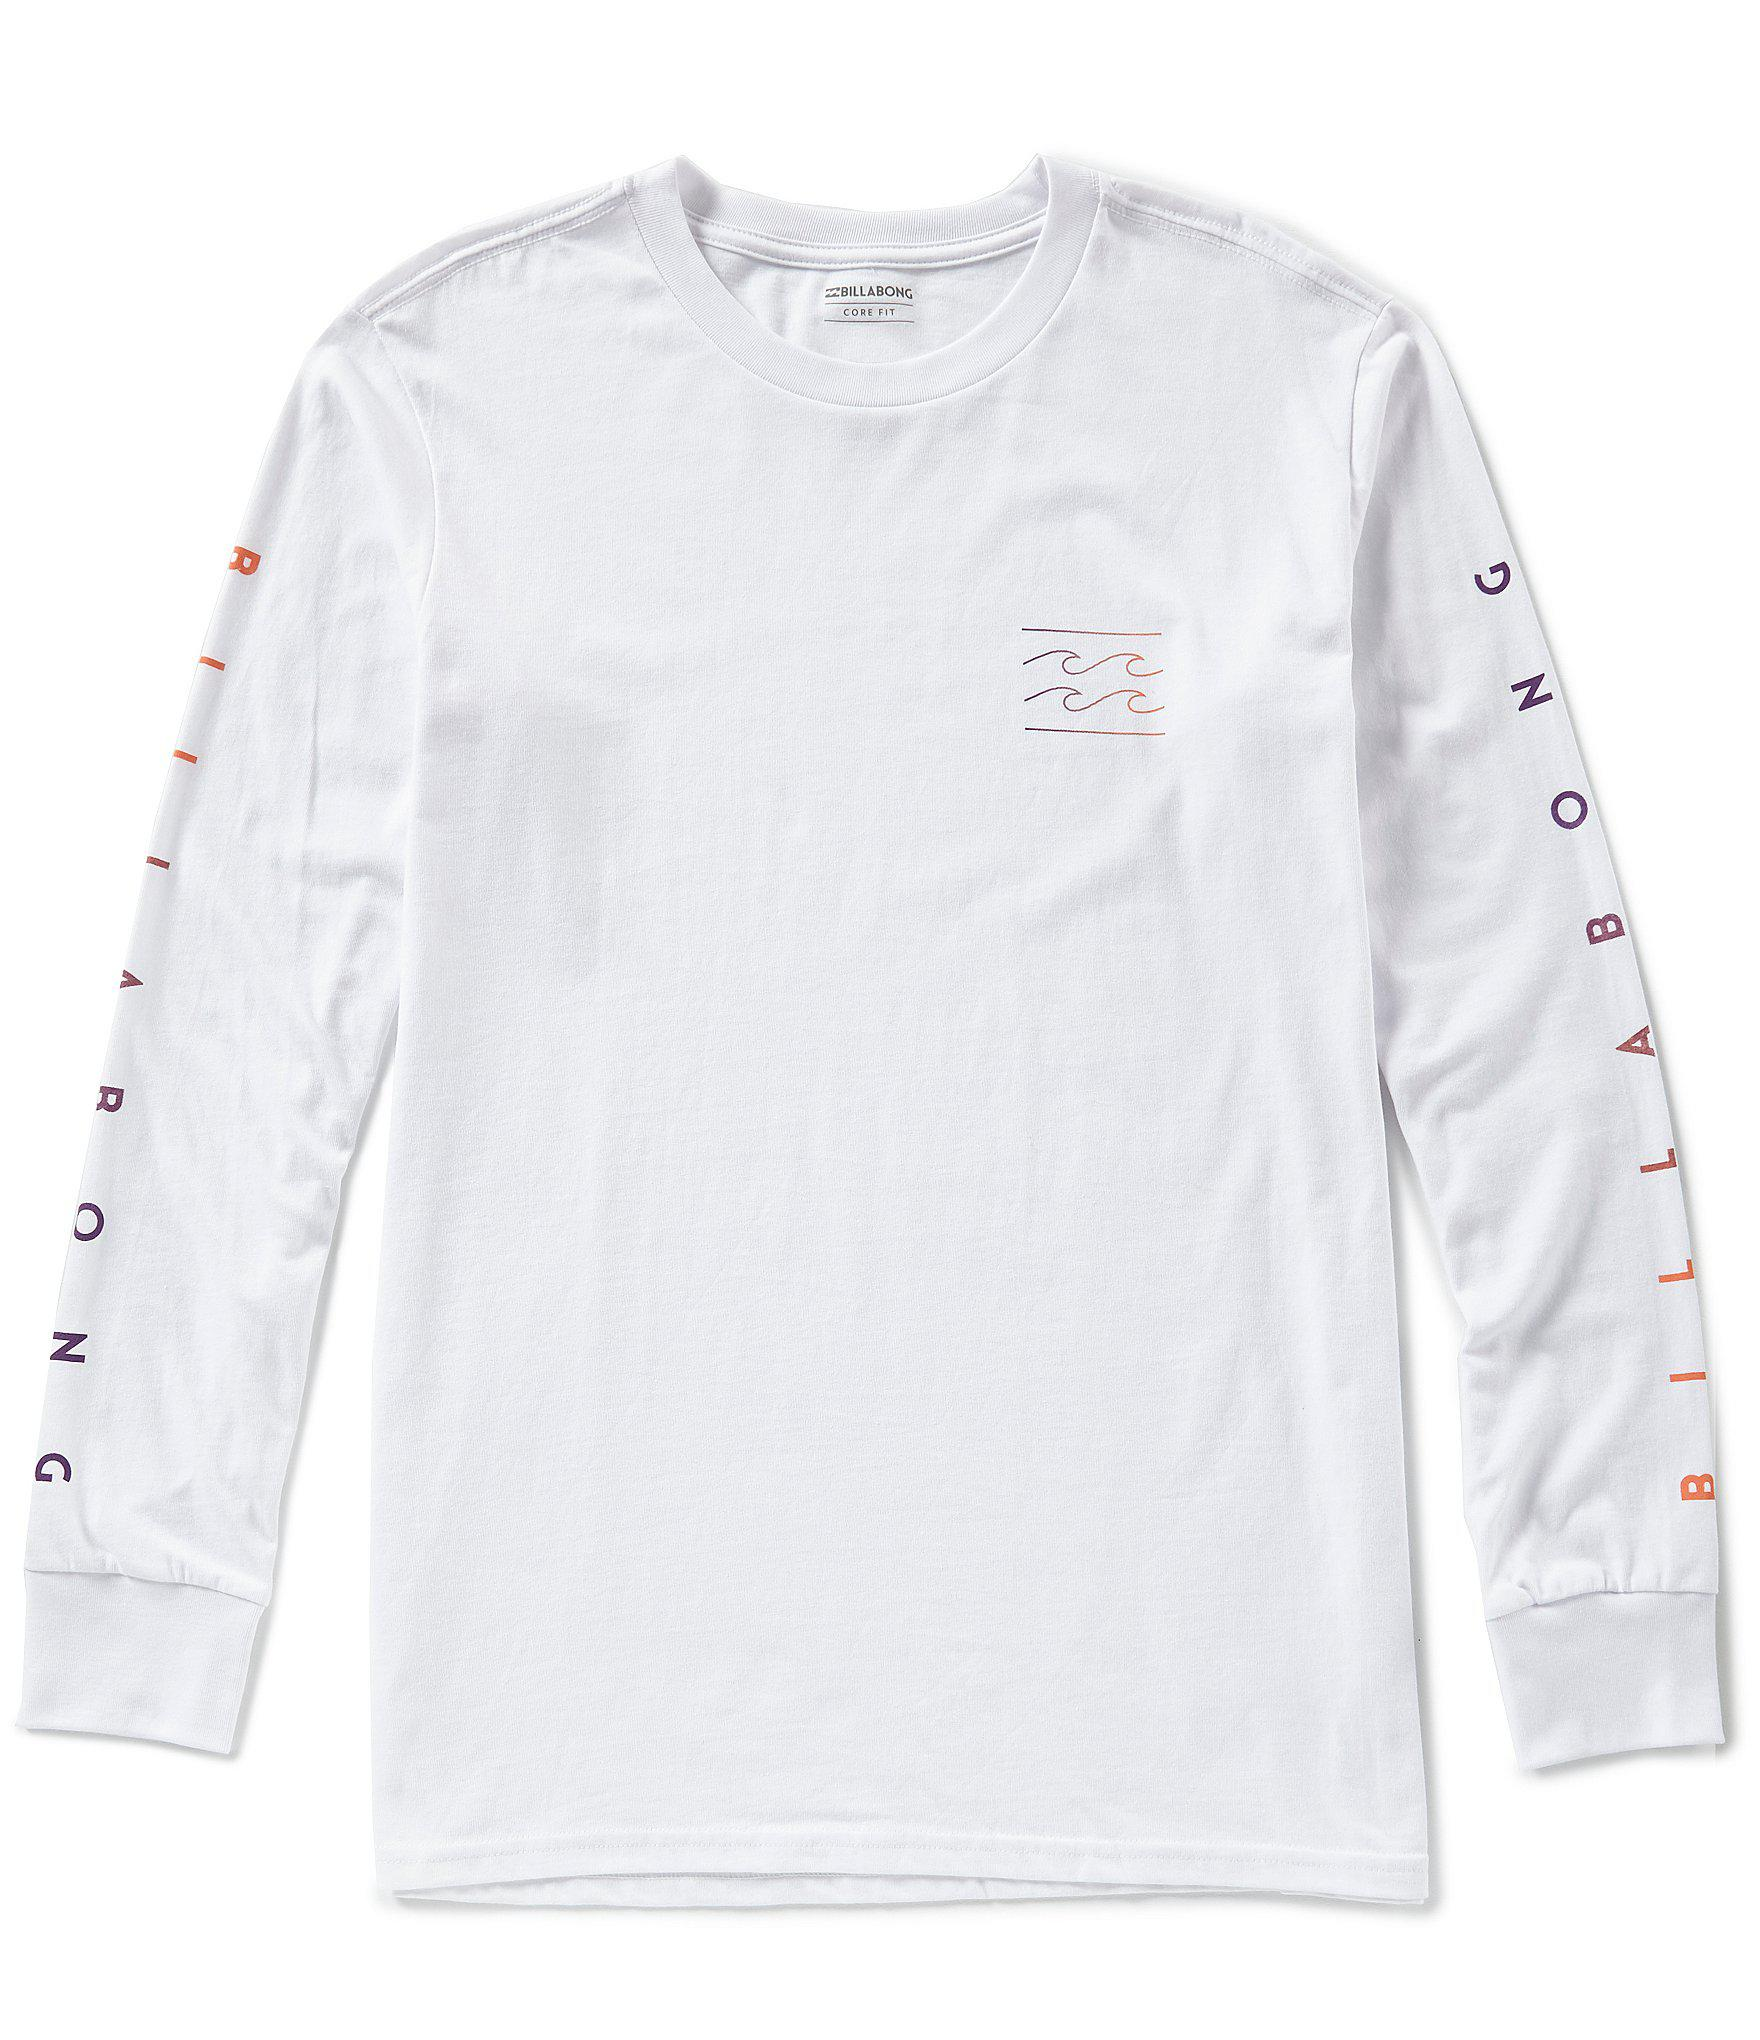 34b160be9ed8 Billabong - White Premium Unity Sleeves Long-sleeve T-shirt - Lyst. View  fullscreen